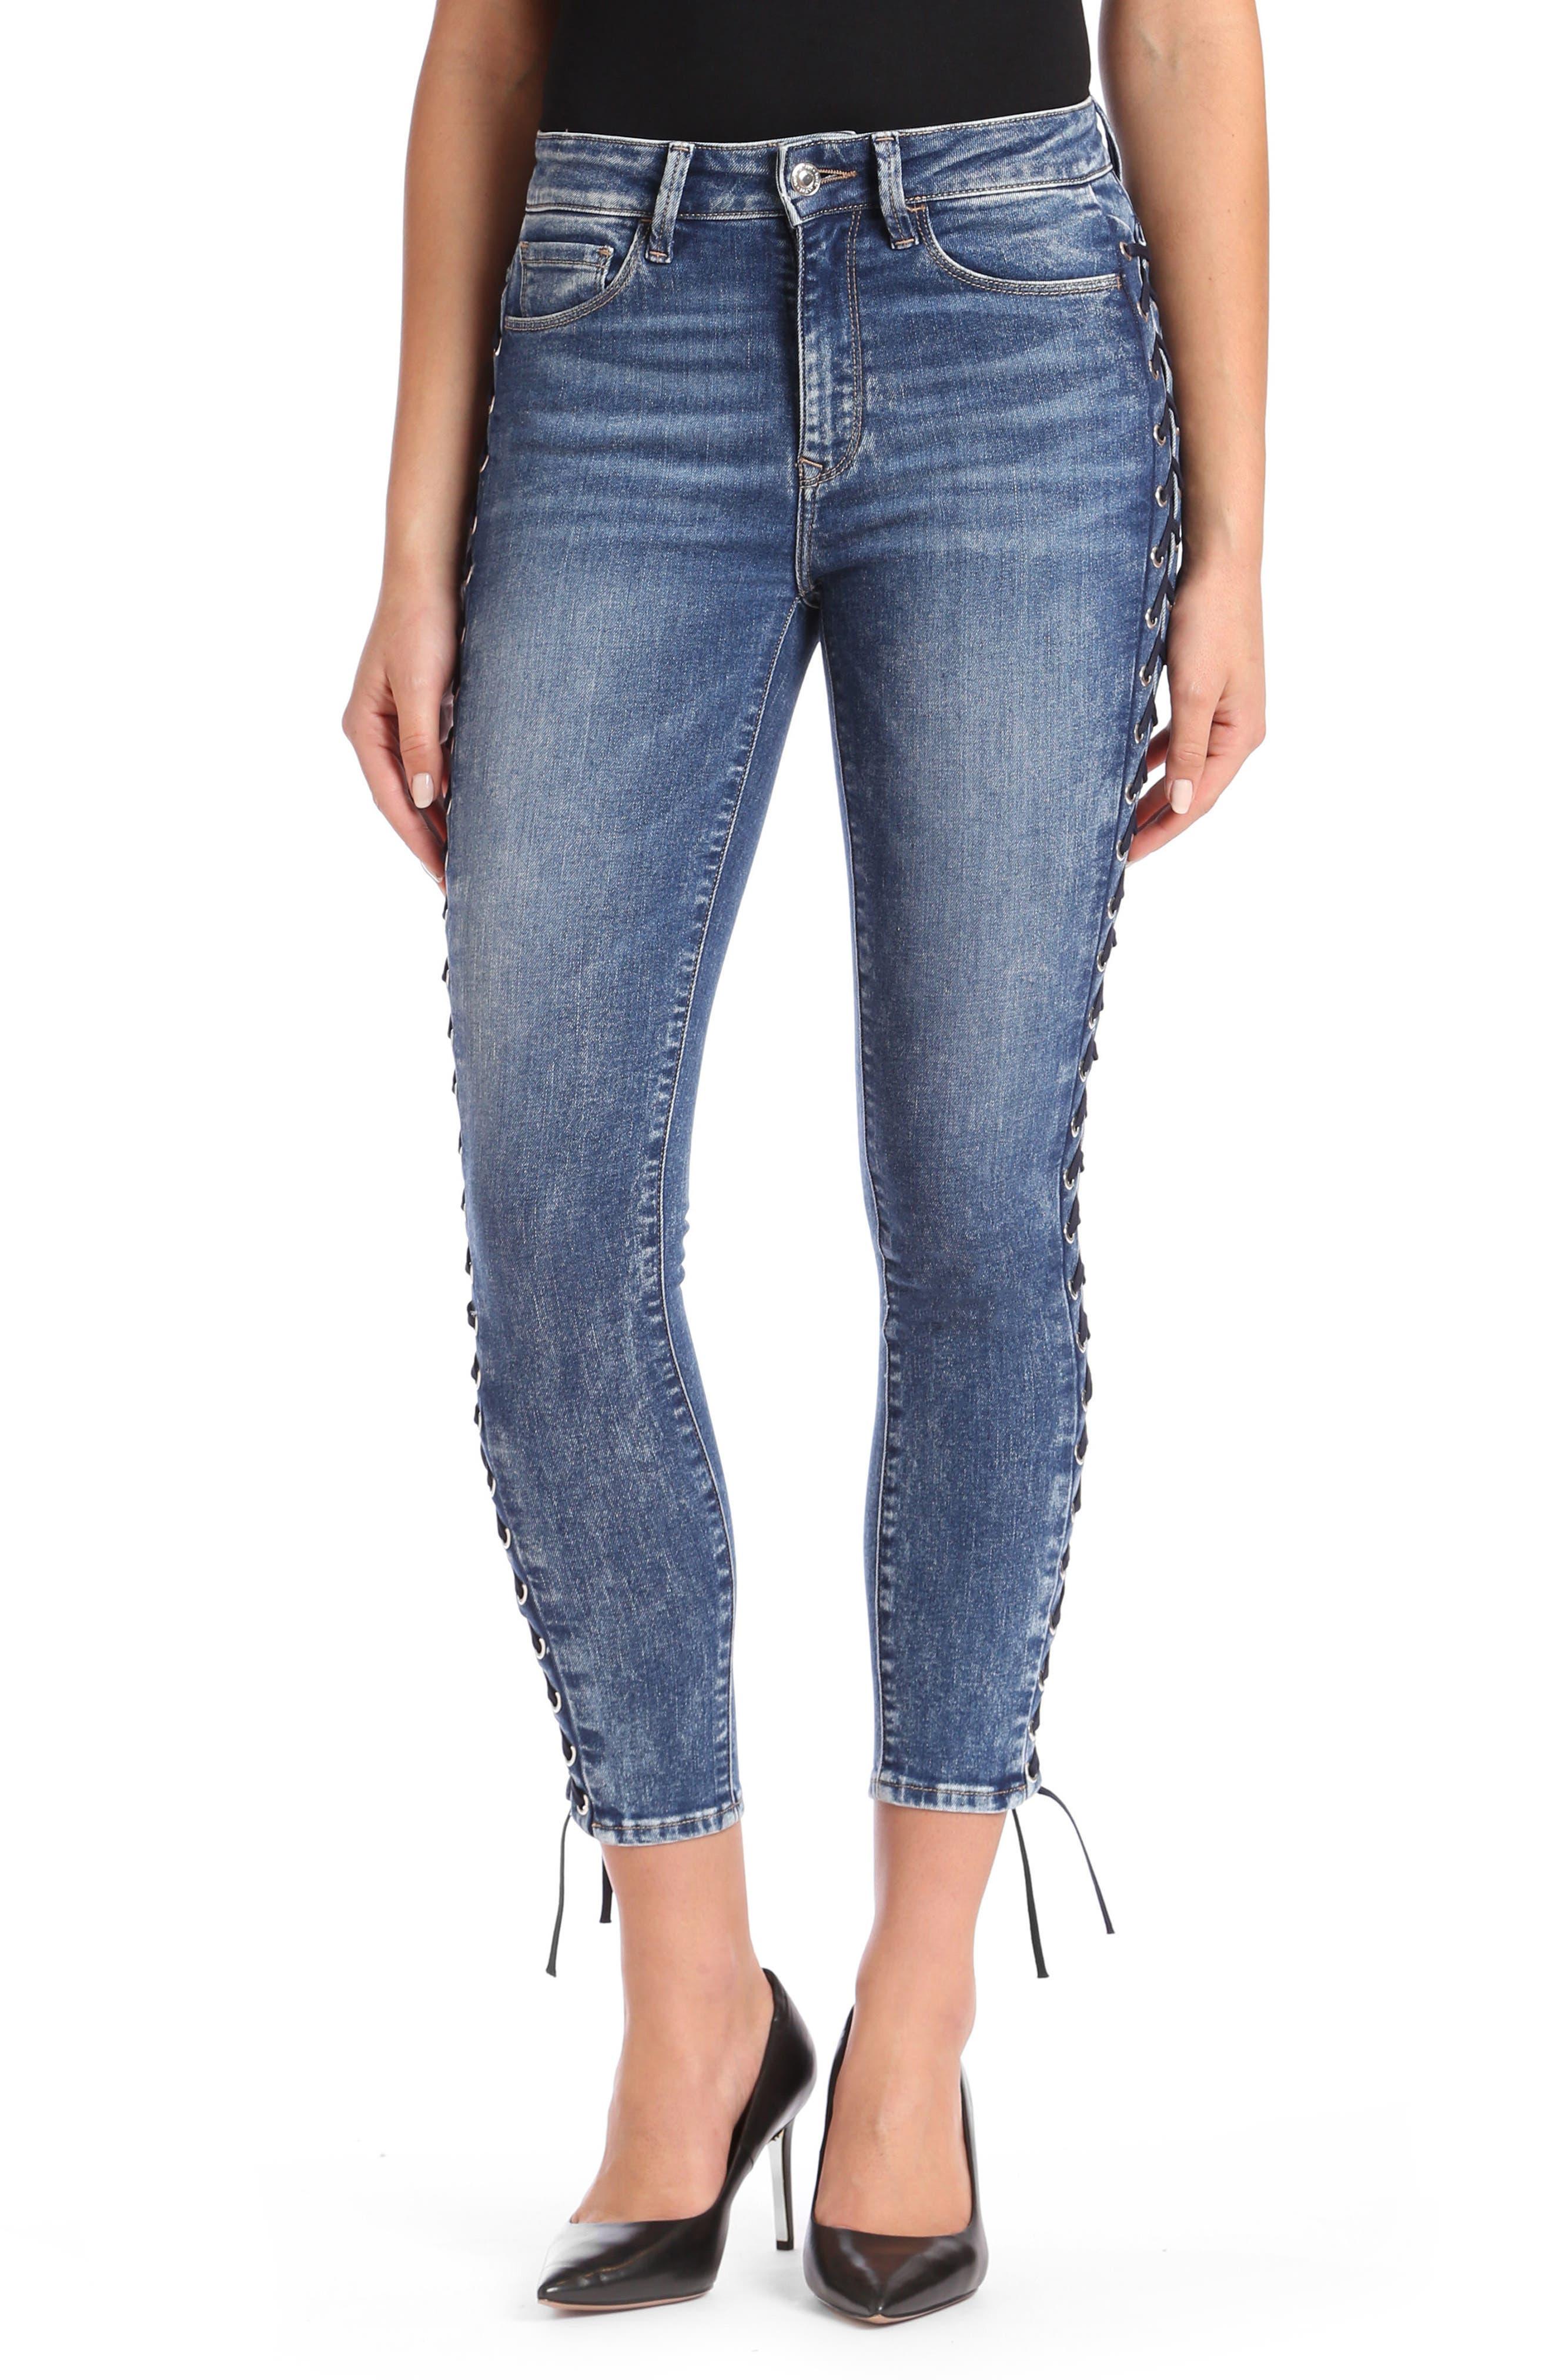 Alternate Image 1 Selected - Mavi Jeans Tess Corset Ankle Skinny Jeans